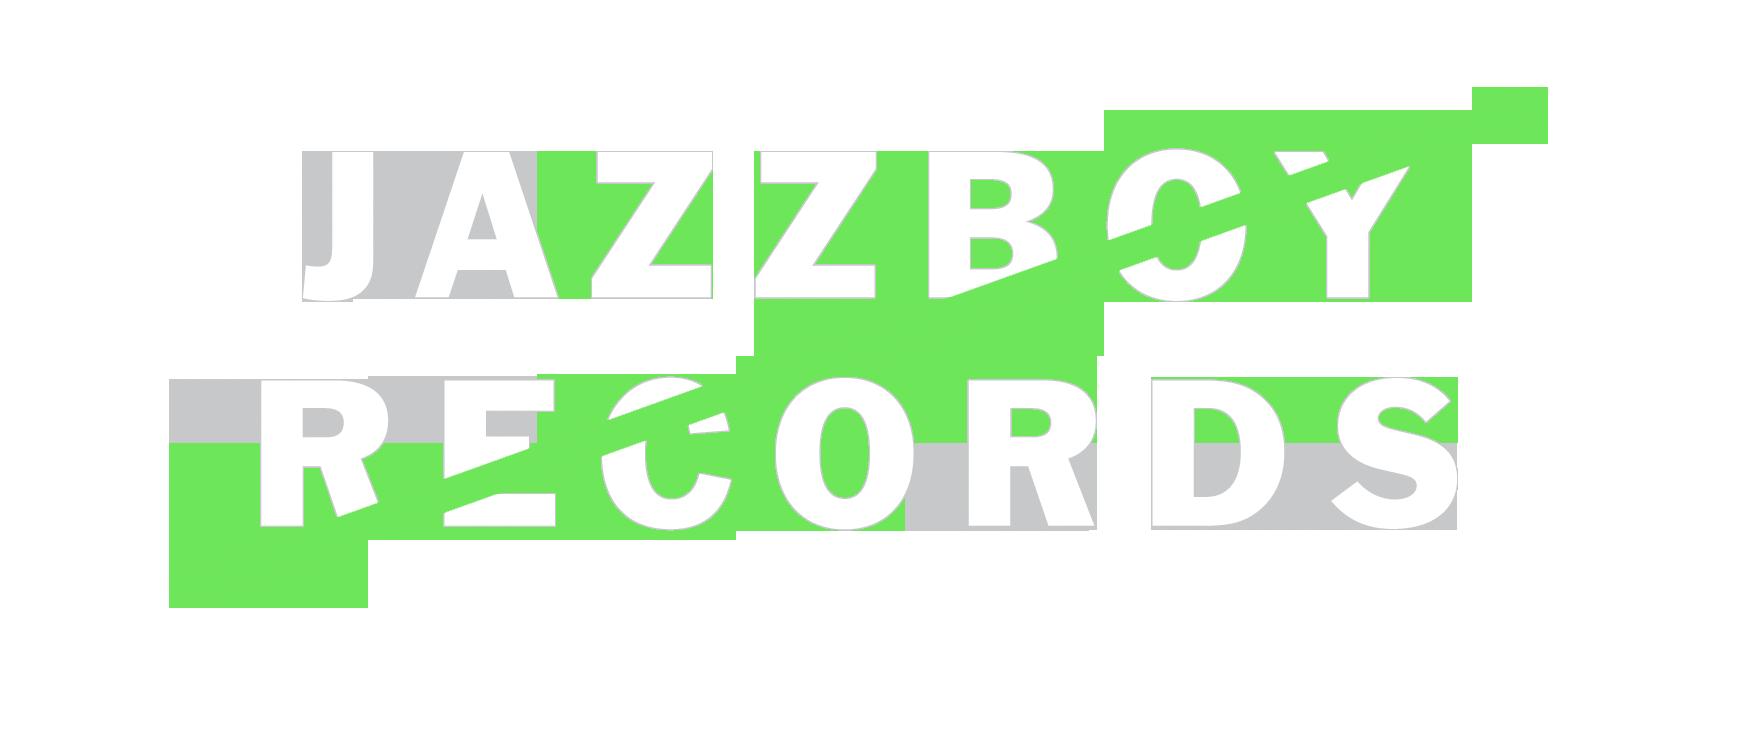 Jazzboy Records Logo